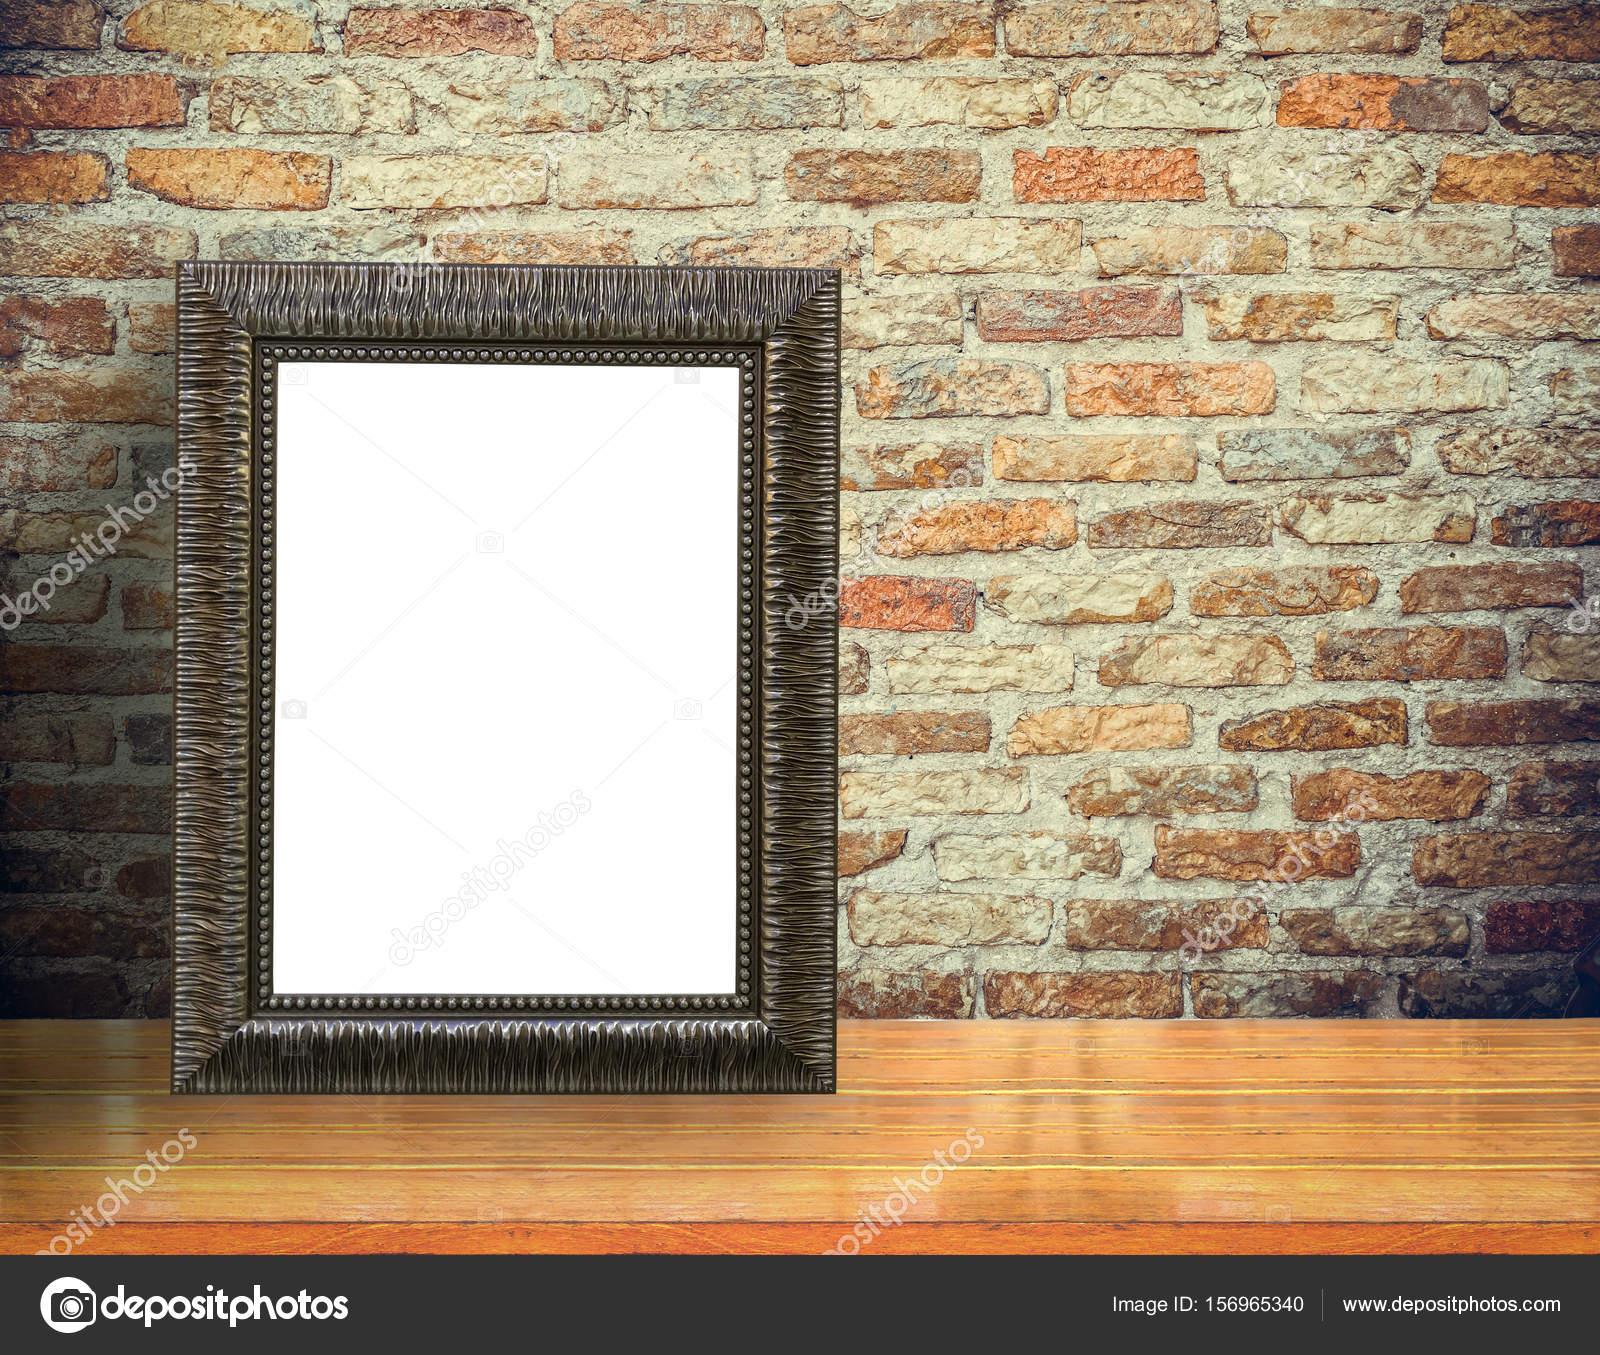 alte bilderrahmen — Stockfoto © thawornnulove #156965340